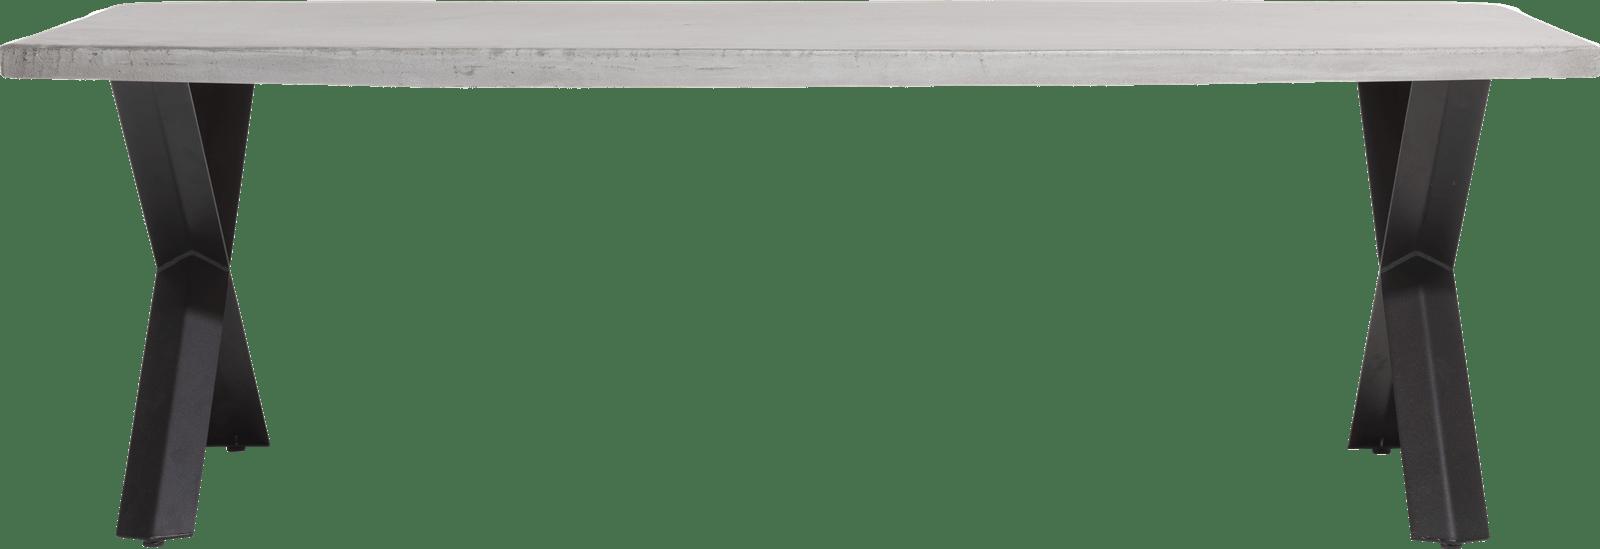 Maddox - eetkamertafel 250 x 100 cm - beton - x-poot